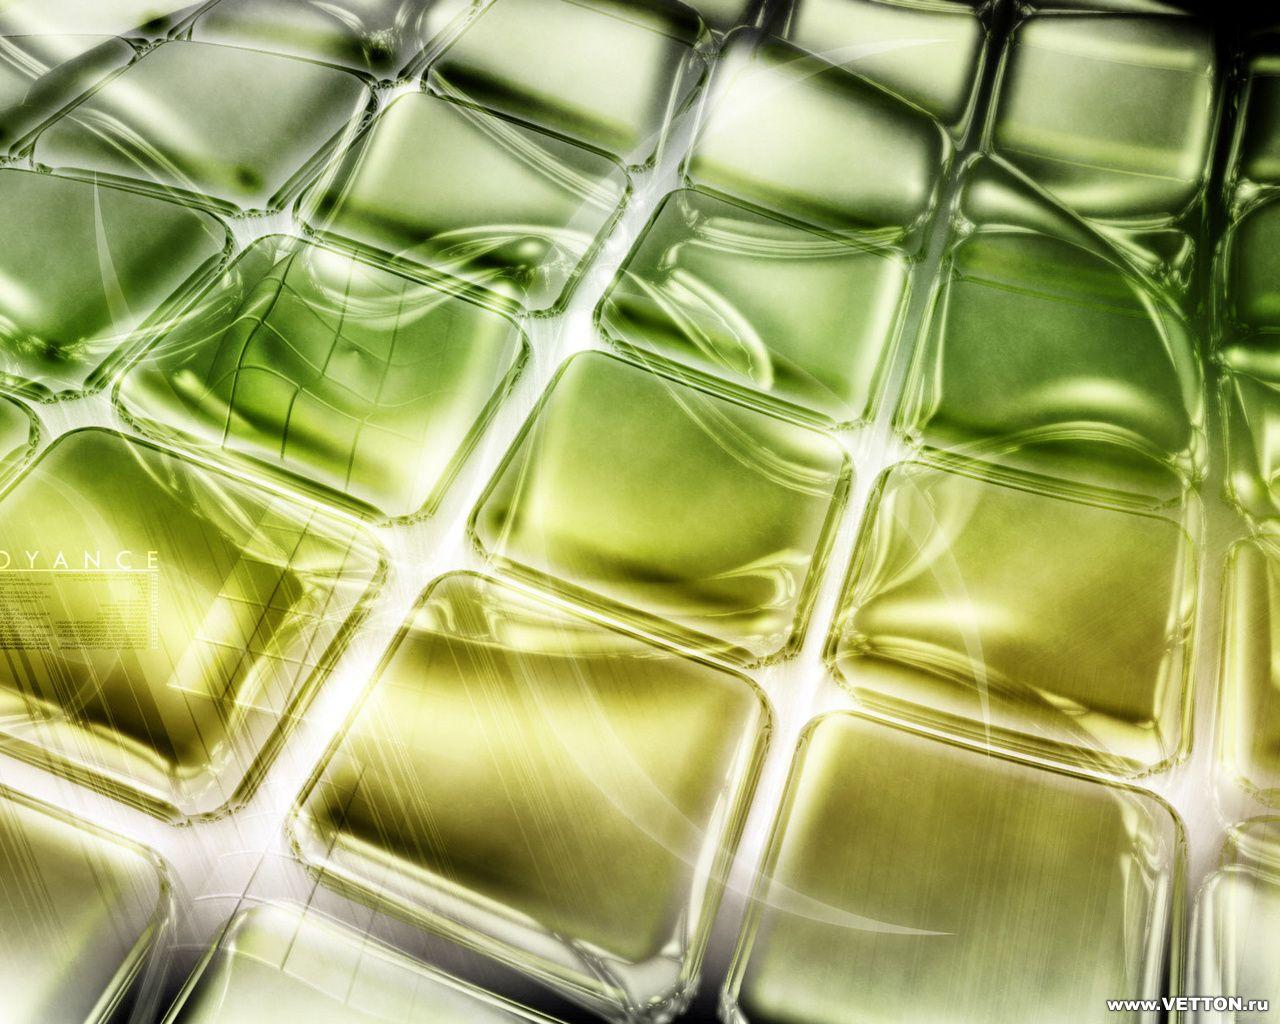 Crystal Wallpaper For Walls: CRYSTAL WALL PAPERS: Crystal Wallpaper